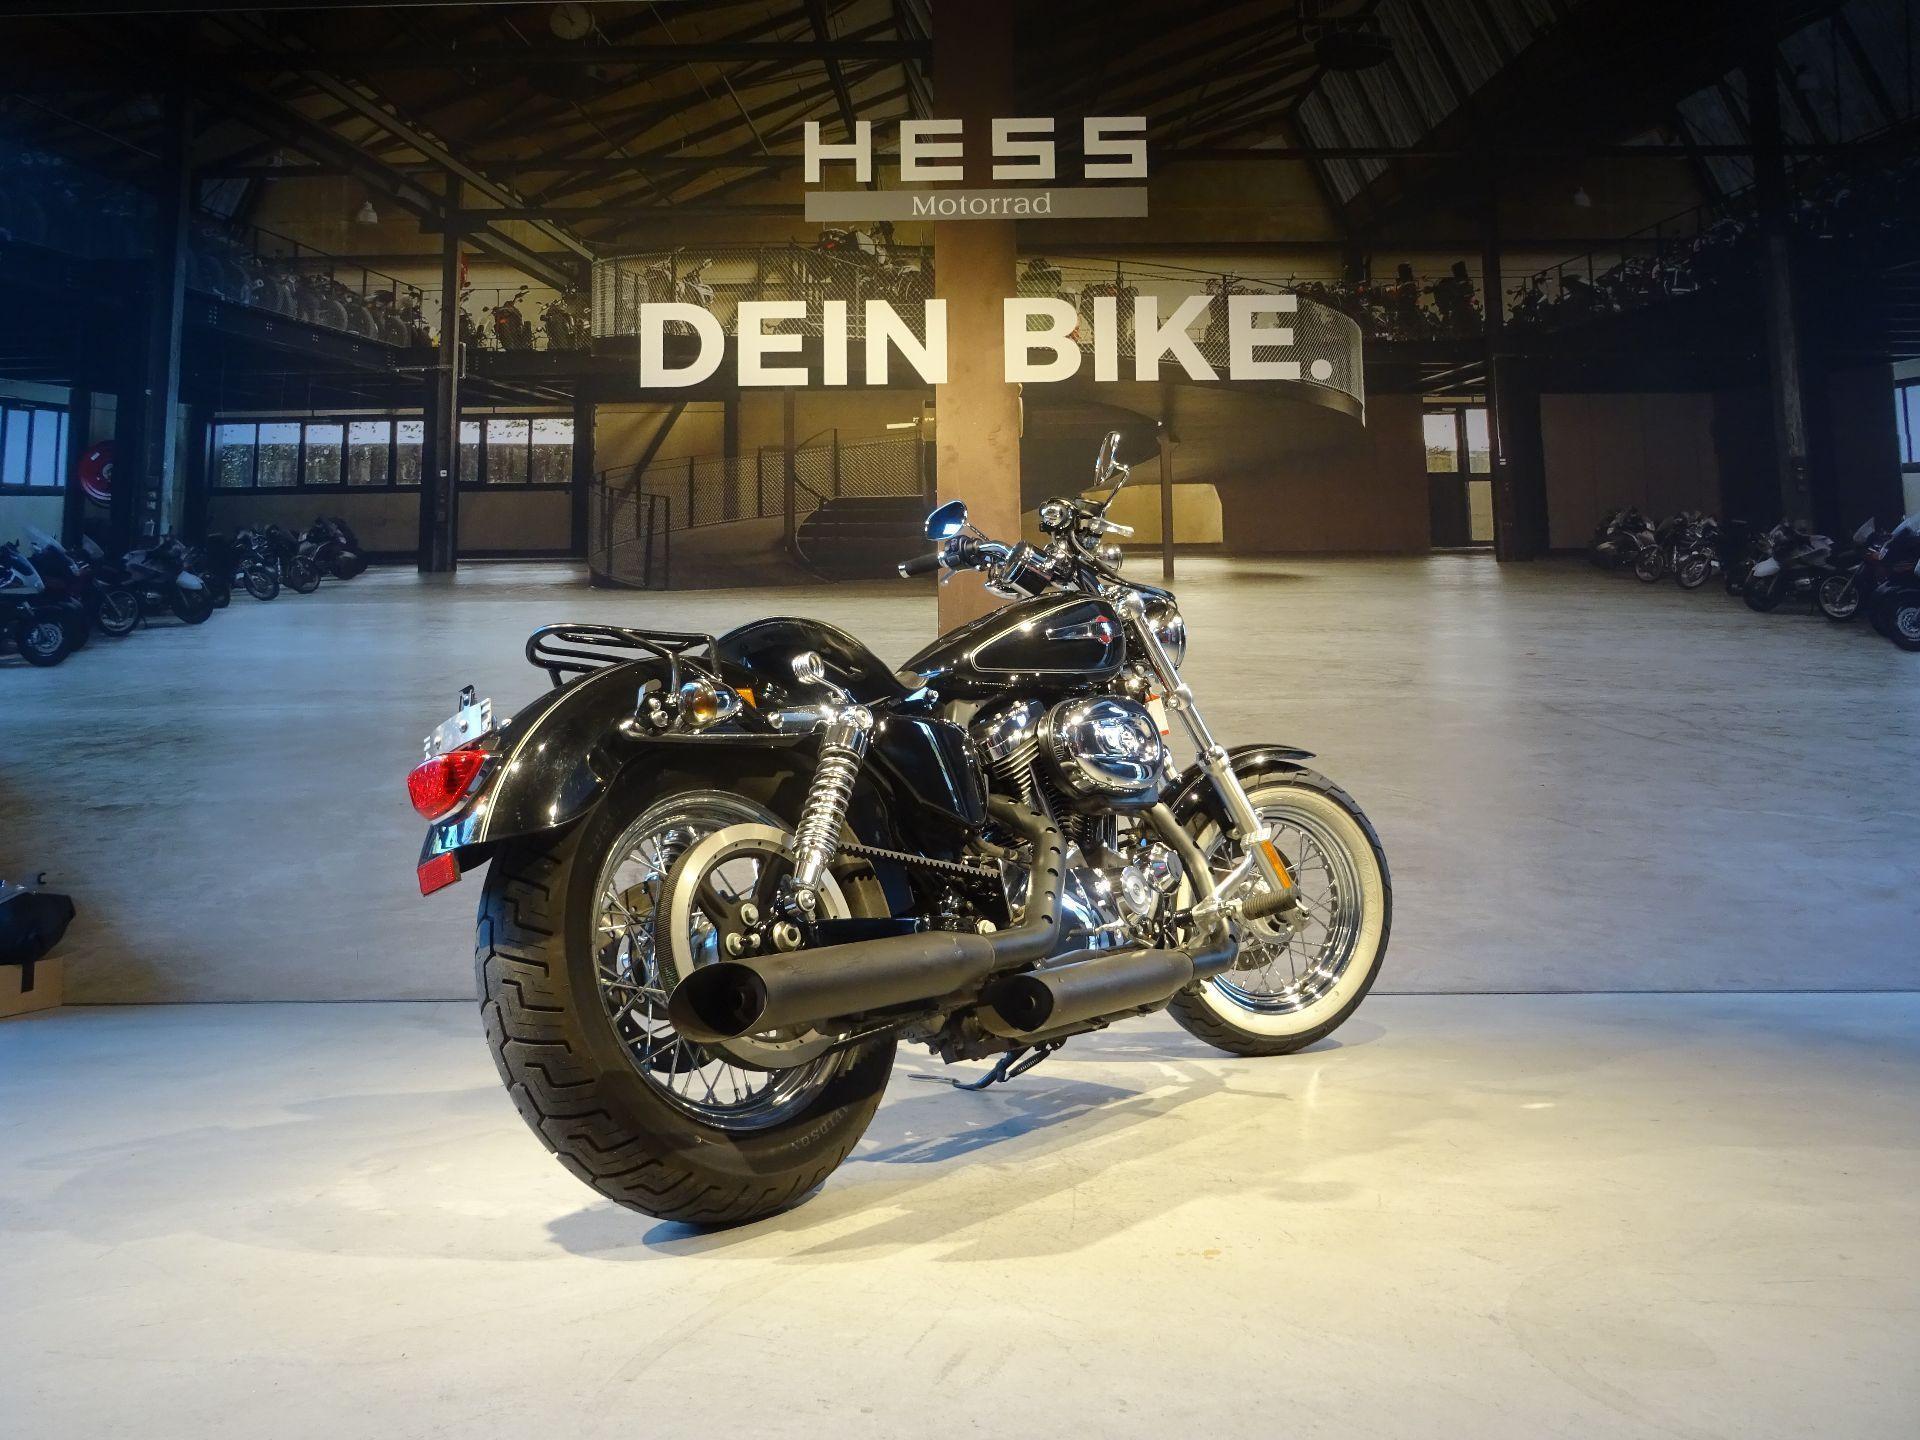 motorrad occasion kaufen harley davidson xl 1200c sportster custom hess motorrad stettlen. Black Bedroom Furniture Sets. Home Design Ideas